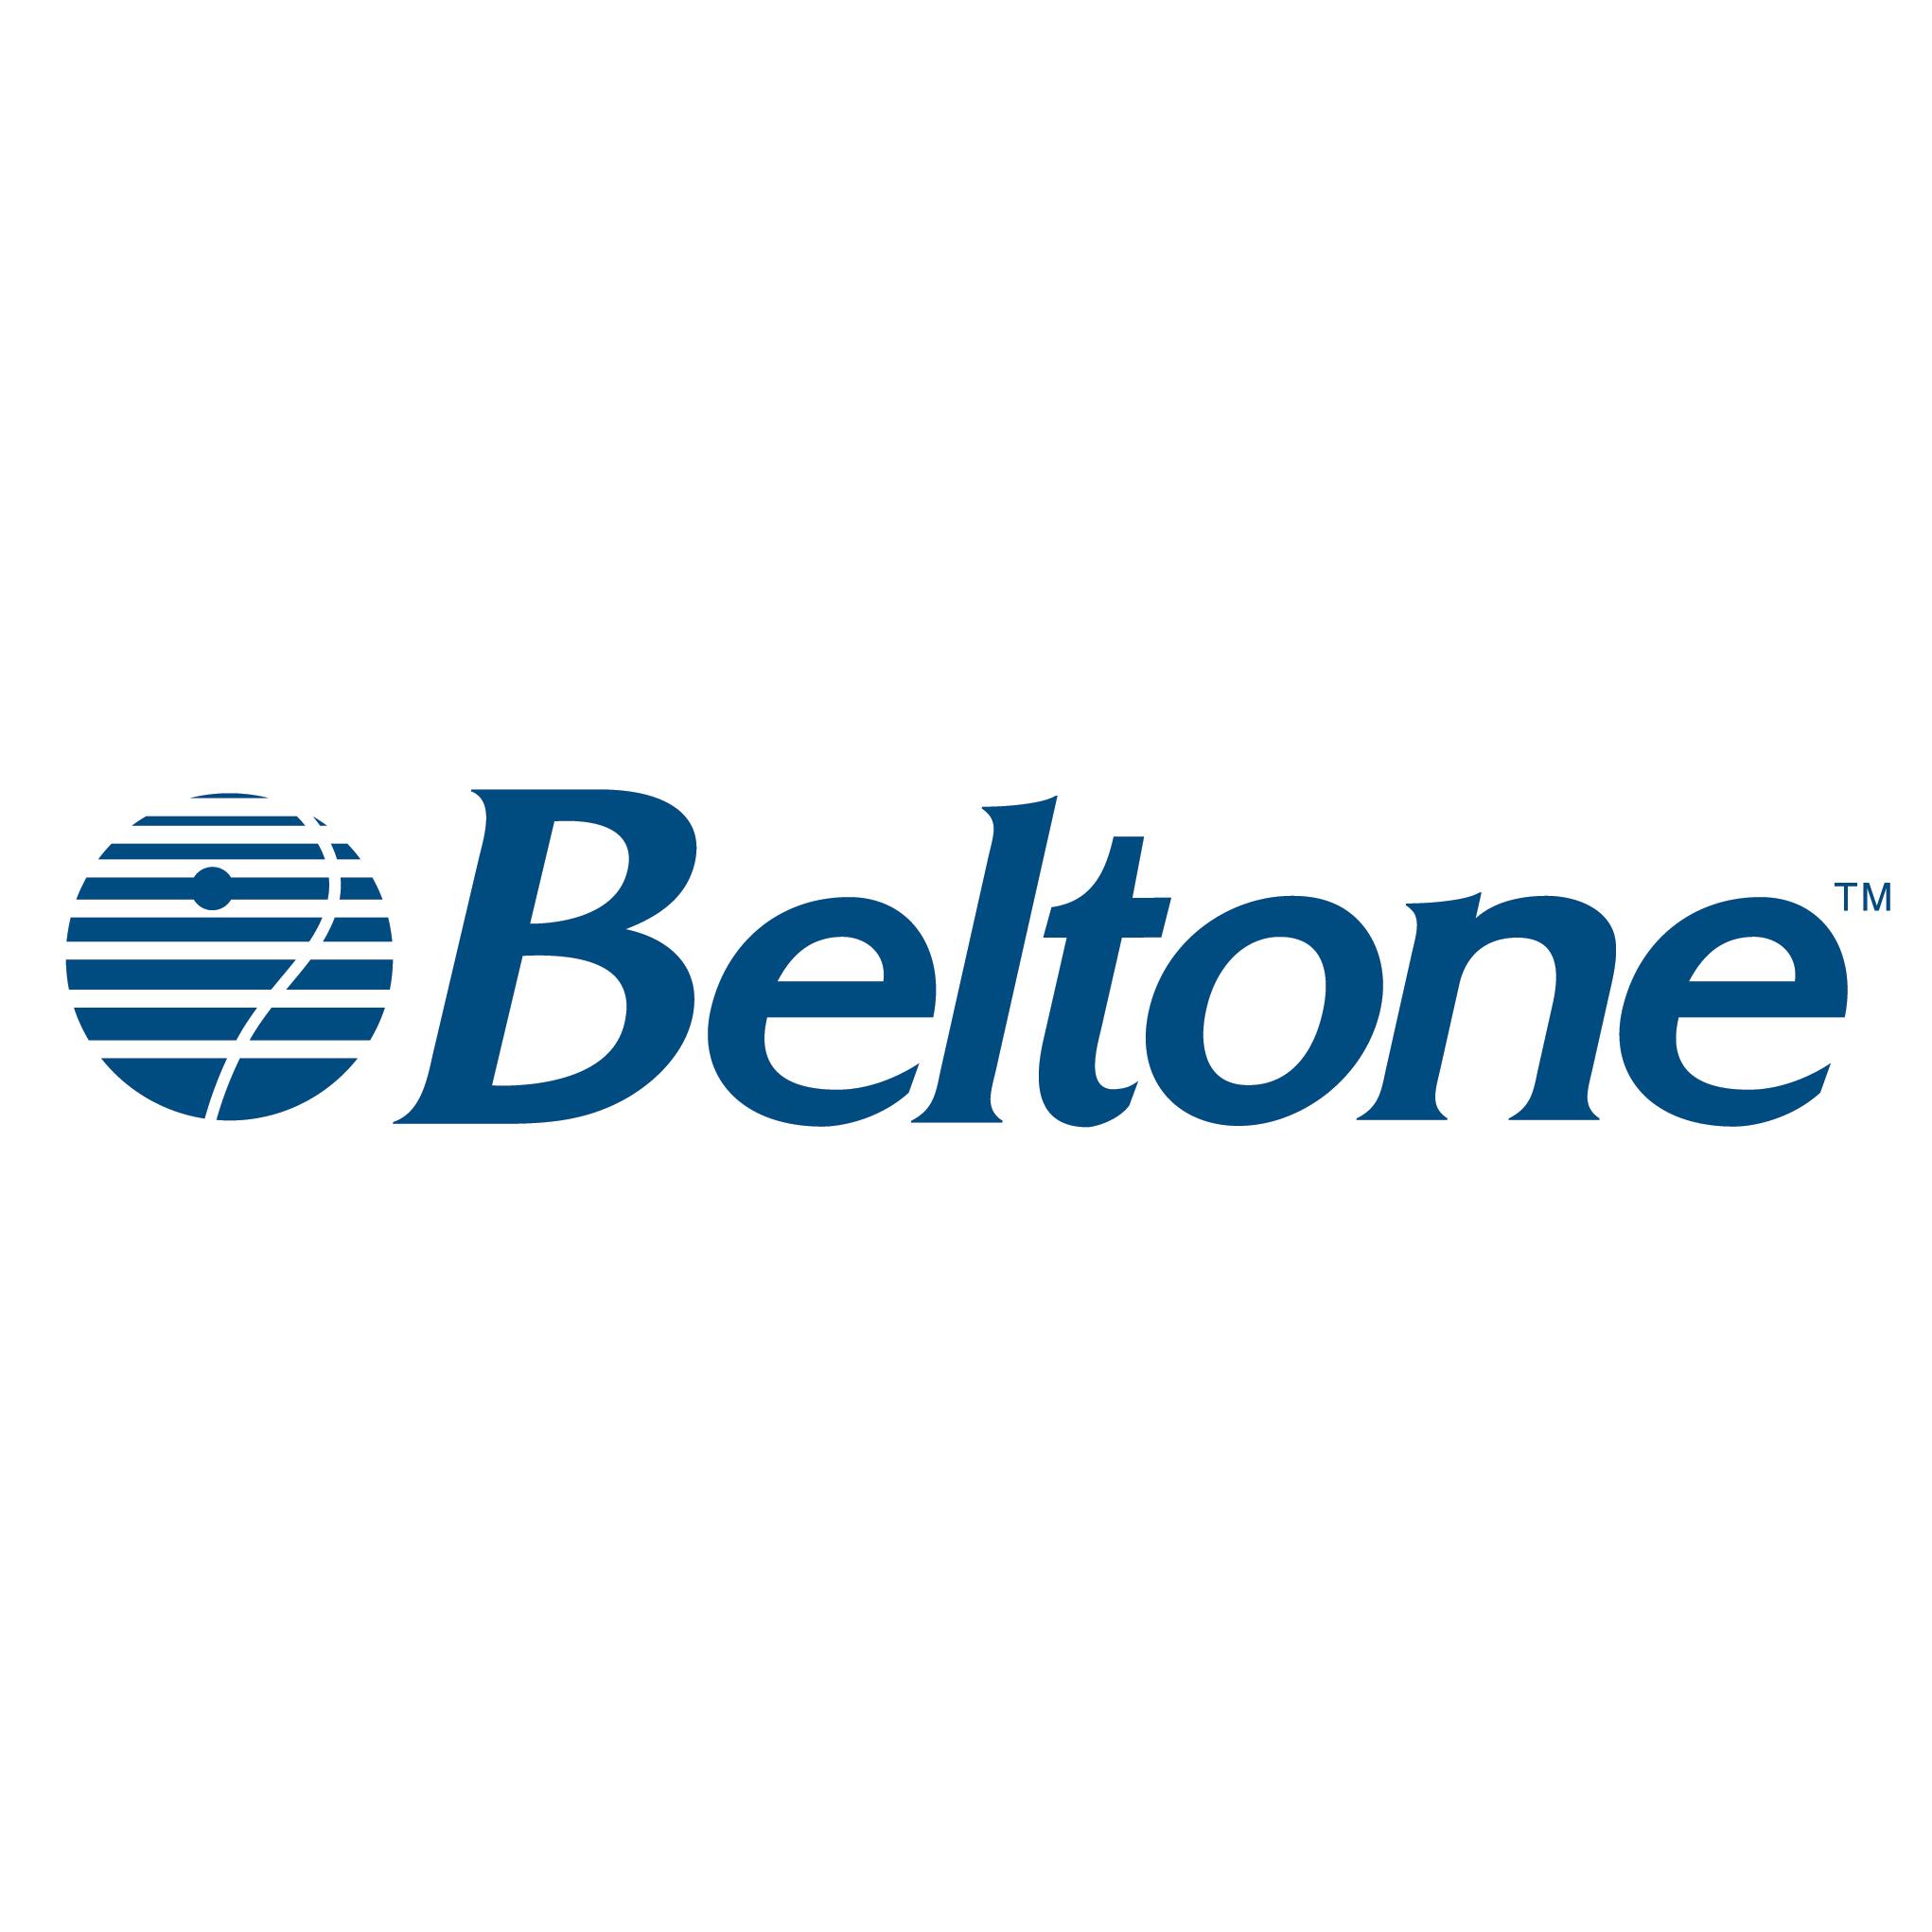 Beltone reviews